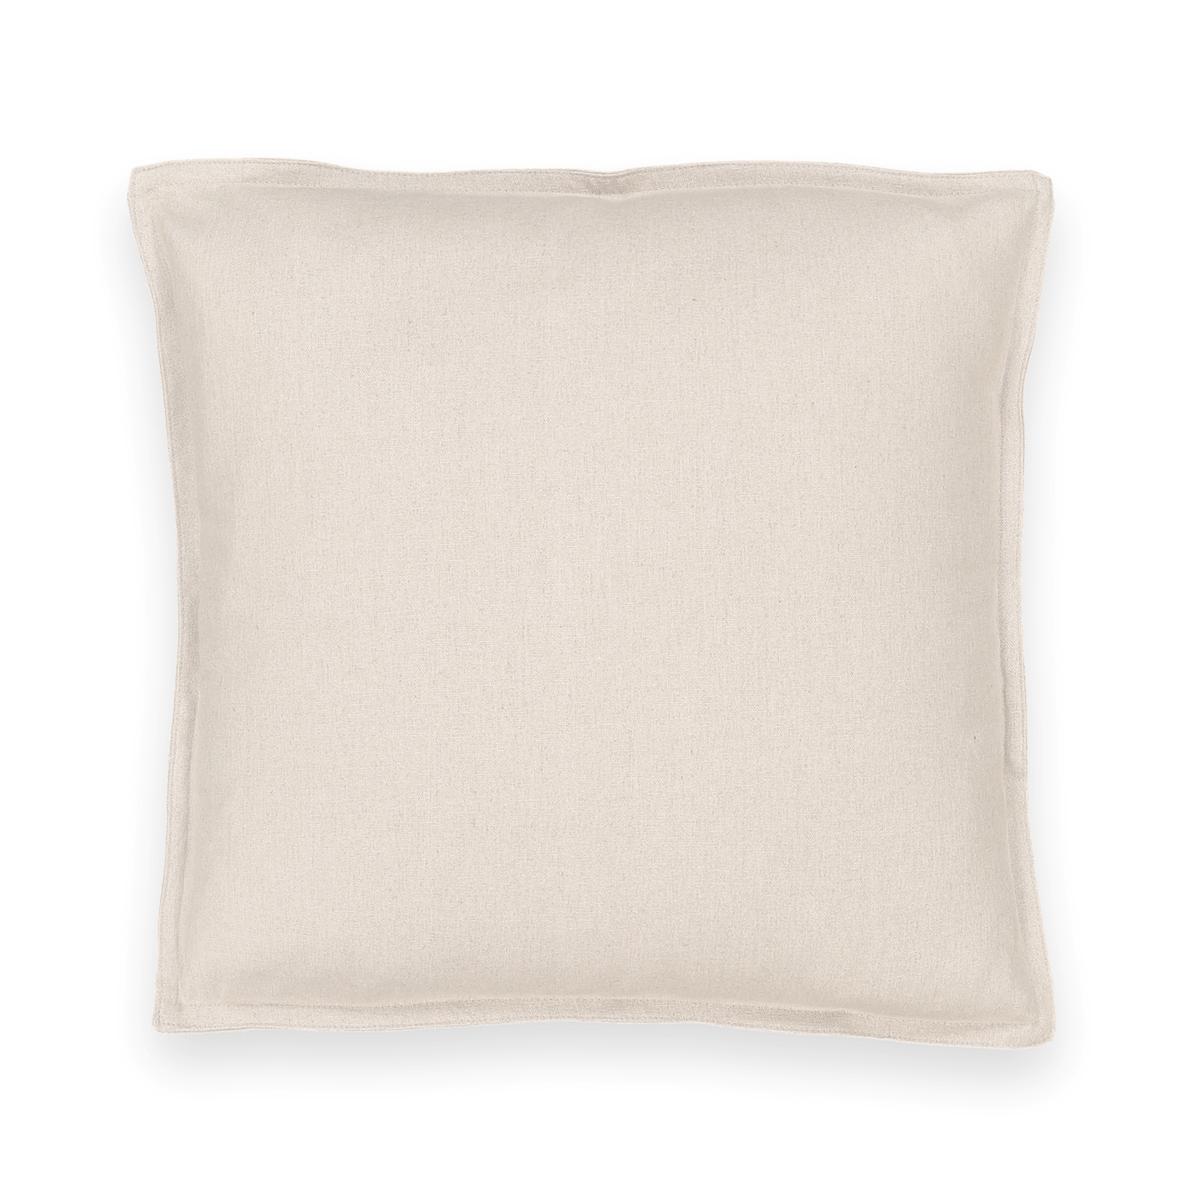 Чехол на подушку из льна/хлопка TAÏMA